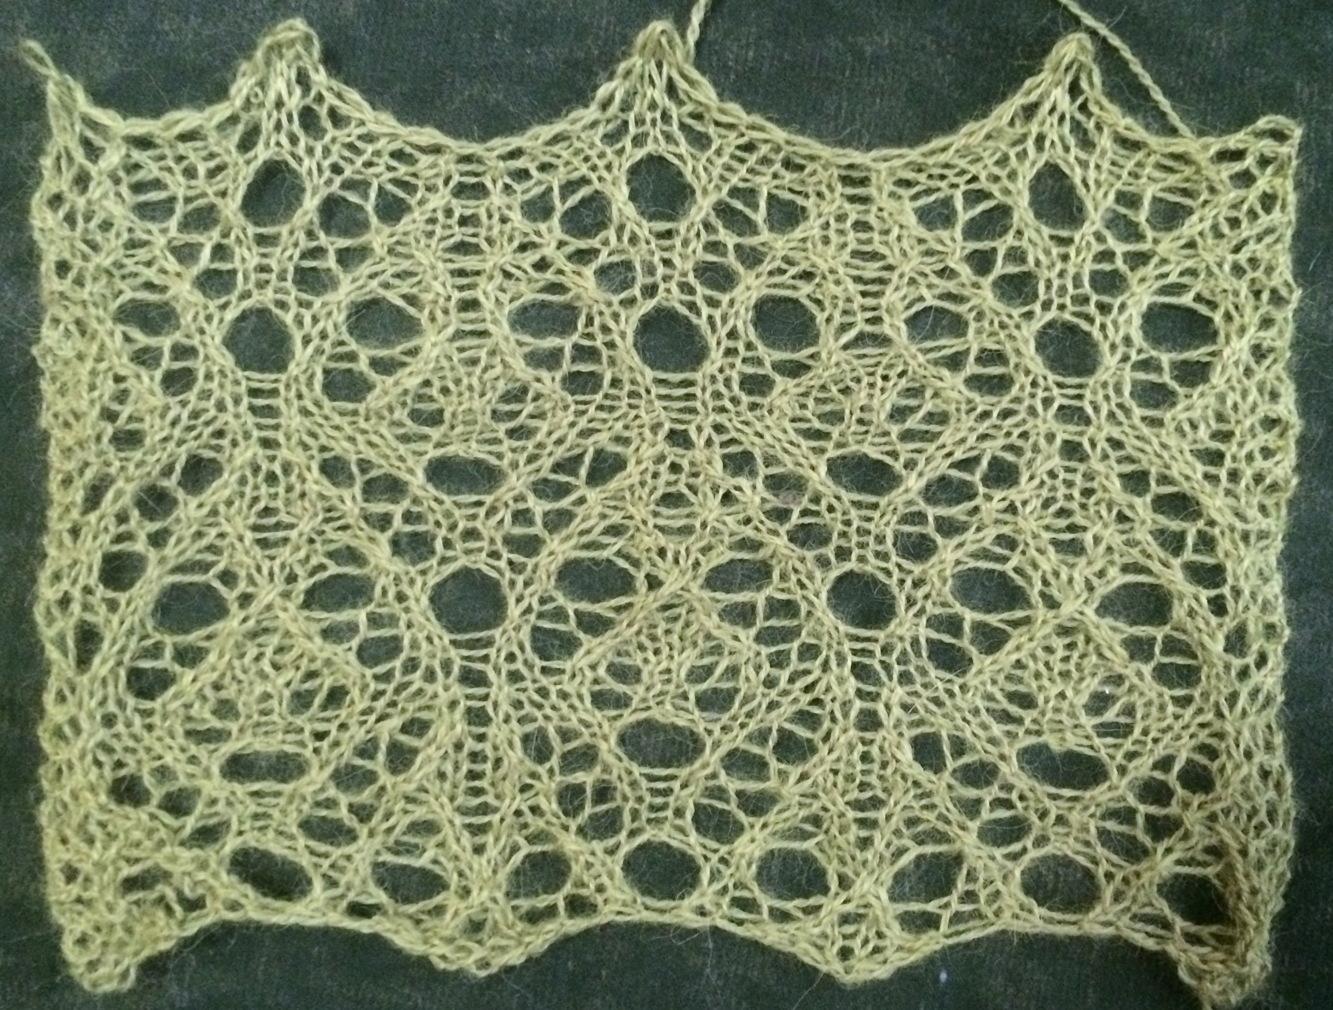 Knitting Lace Stitches Patterns : Groundhog a free lace knitting stitch pattern string